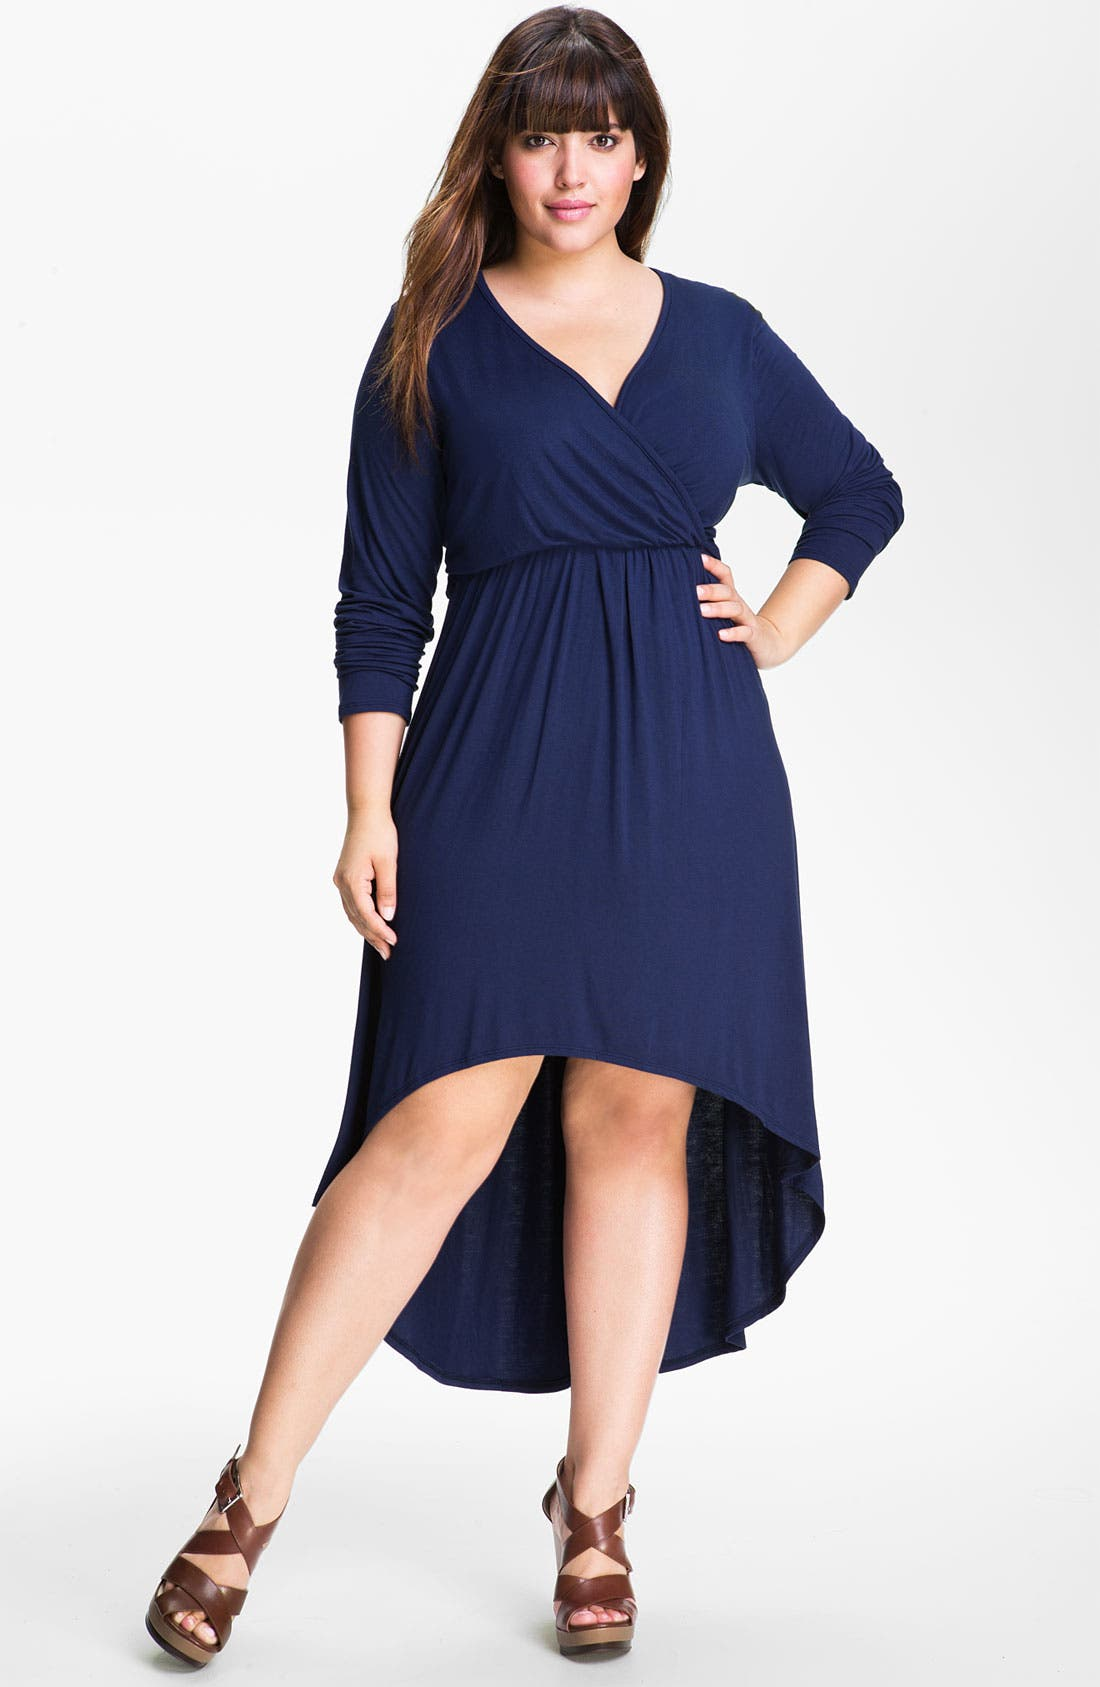 Main Image - Loveappella High Low Faux Wrap Dress (Plus)